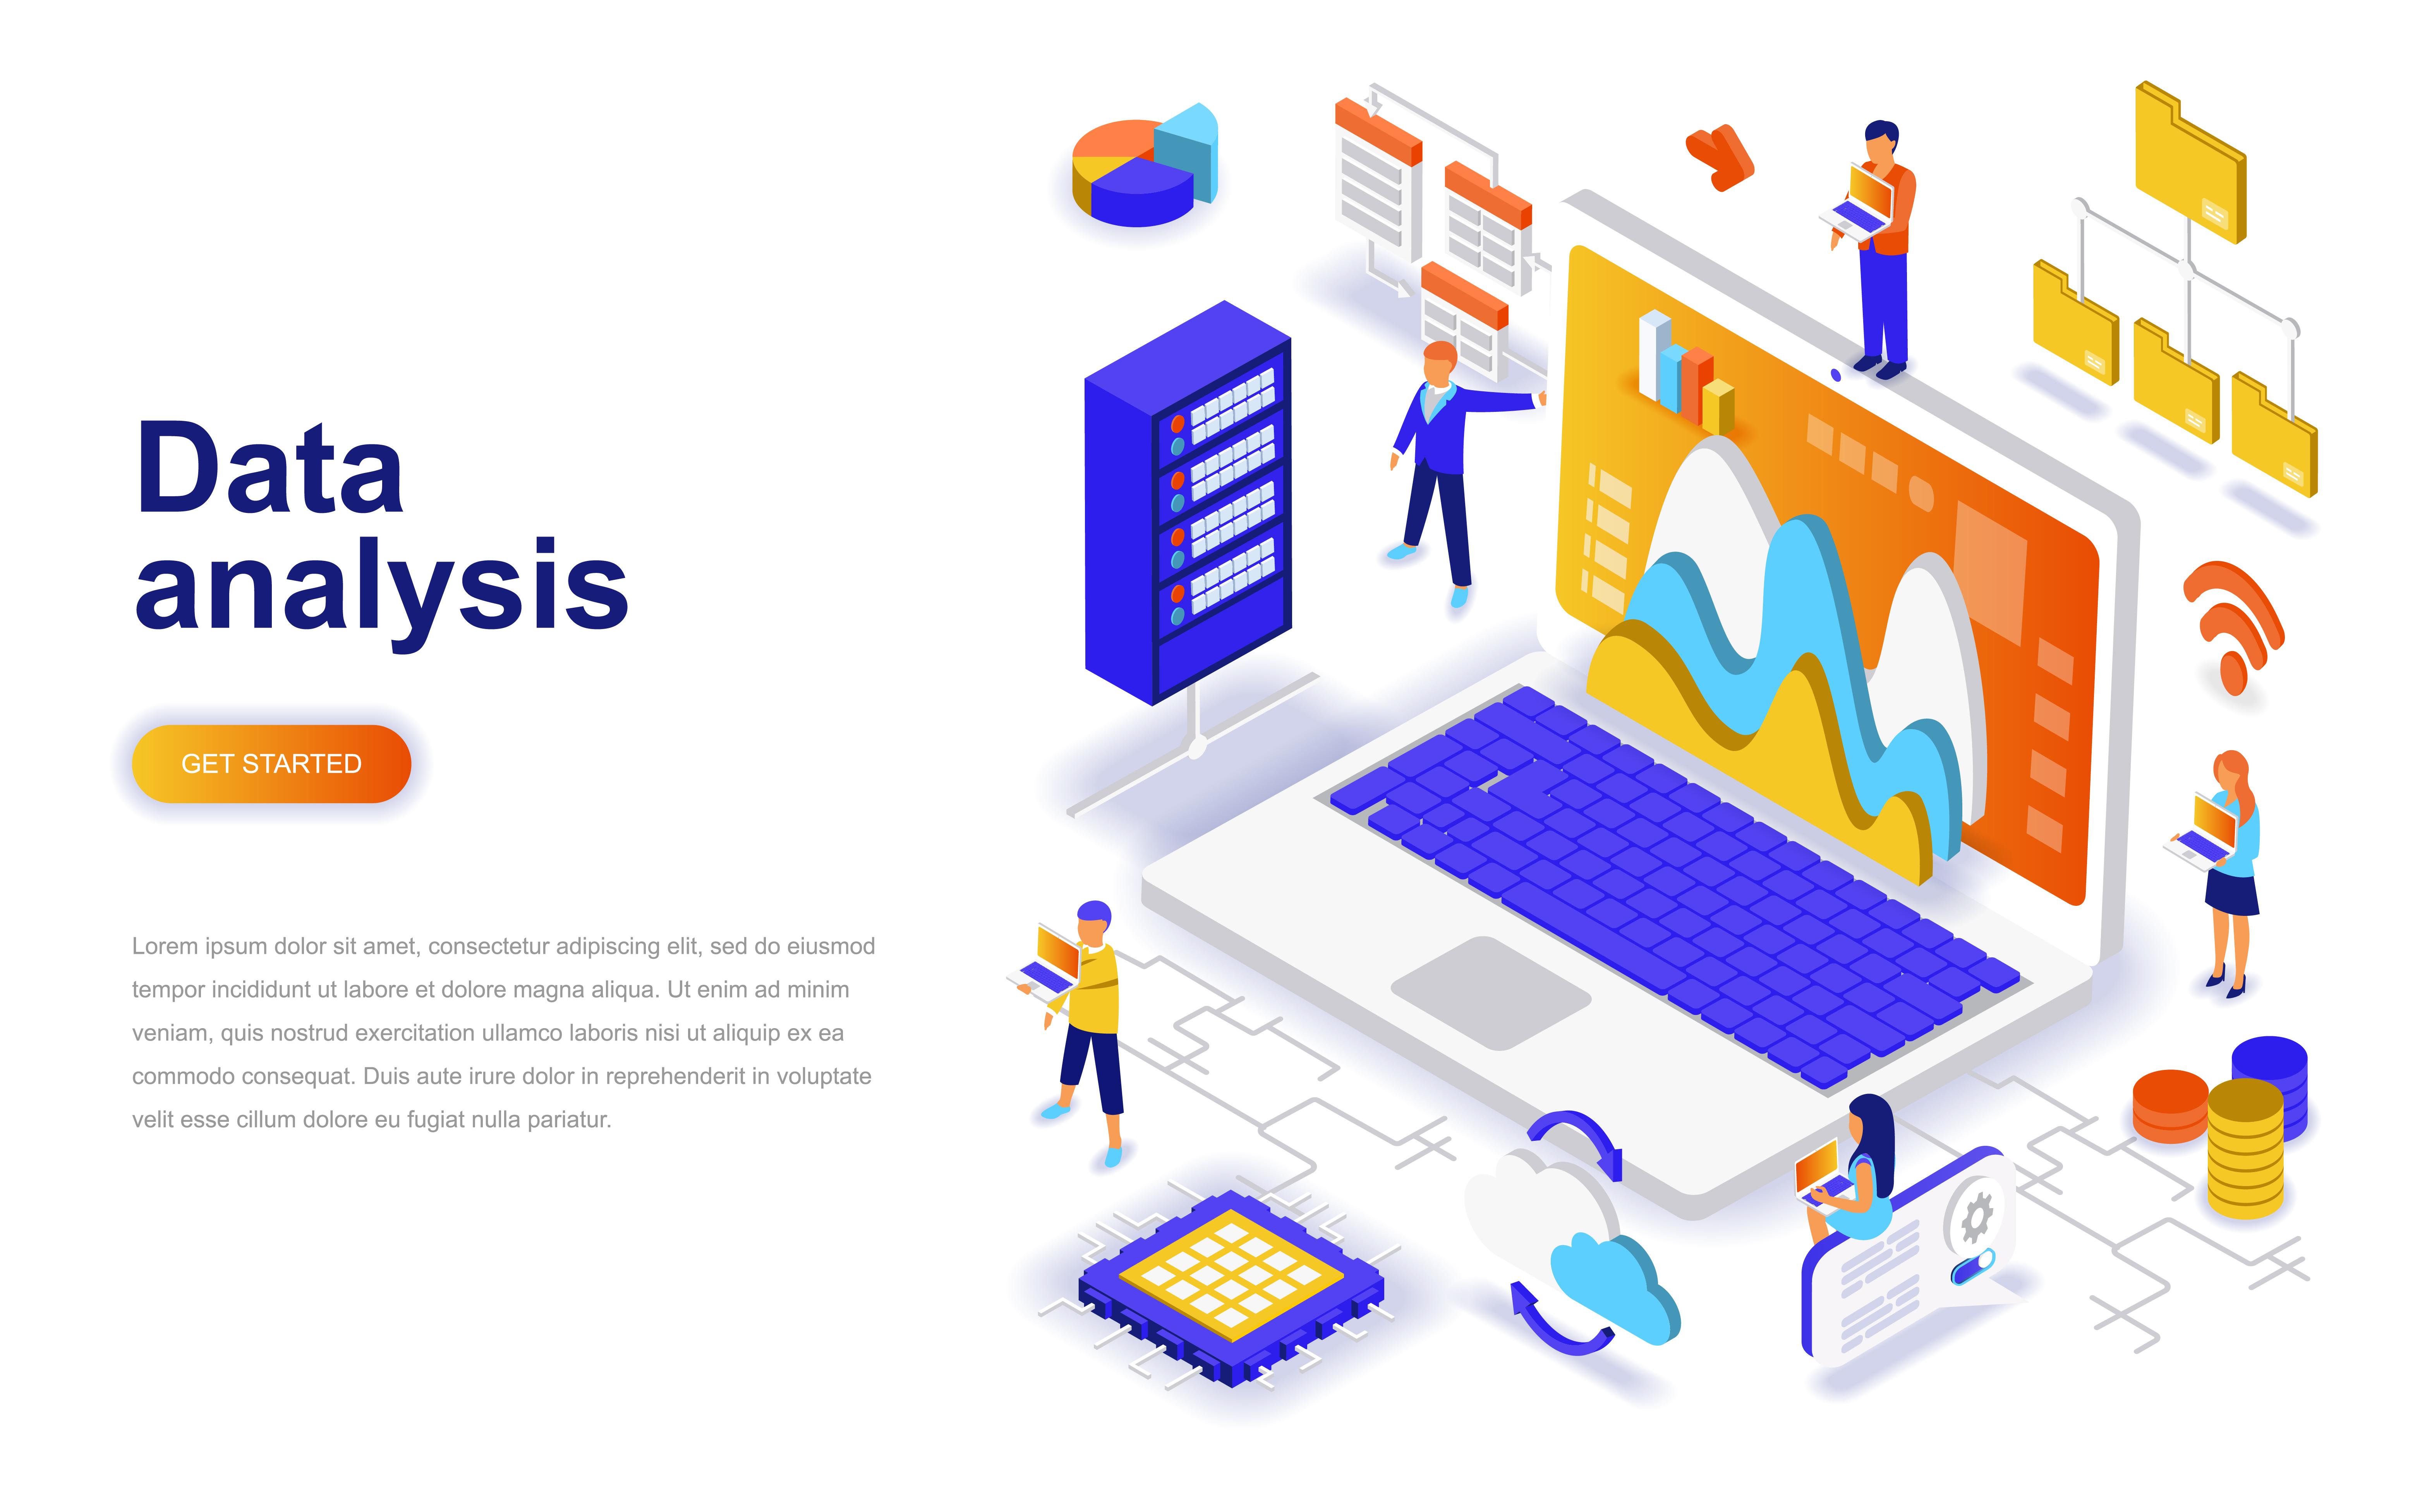 data analysis modern flat design isometric concept